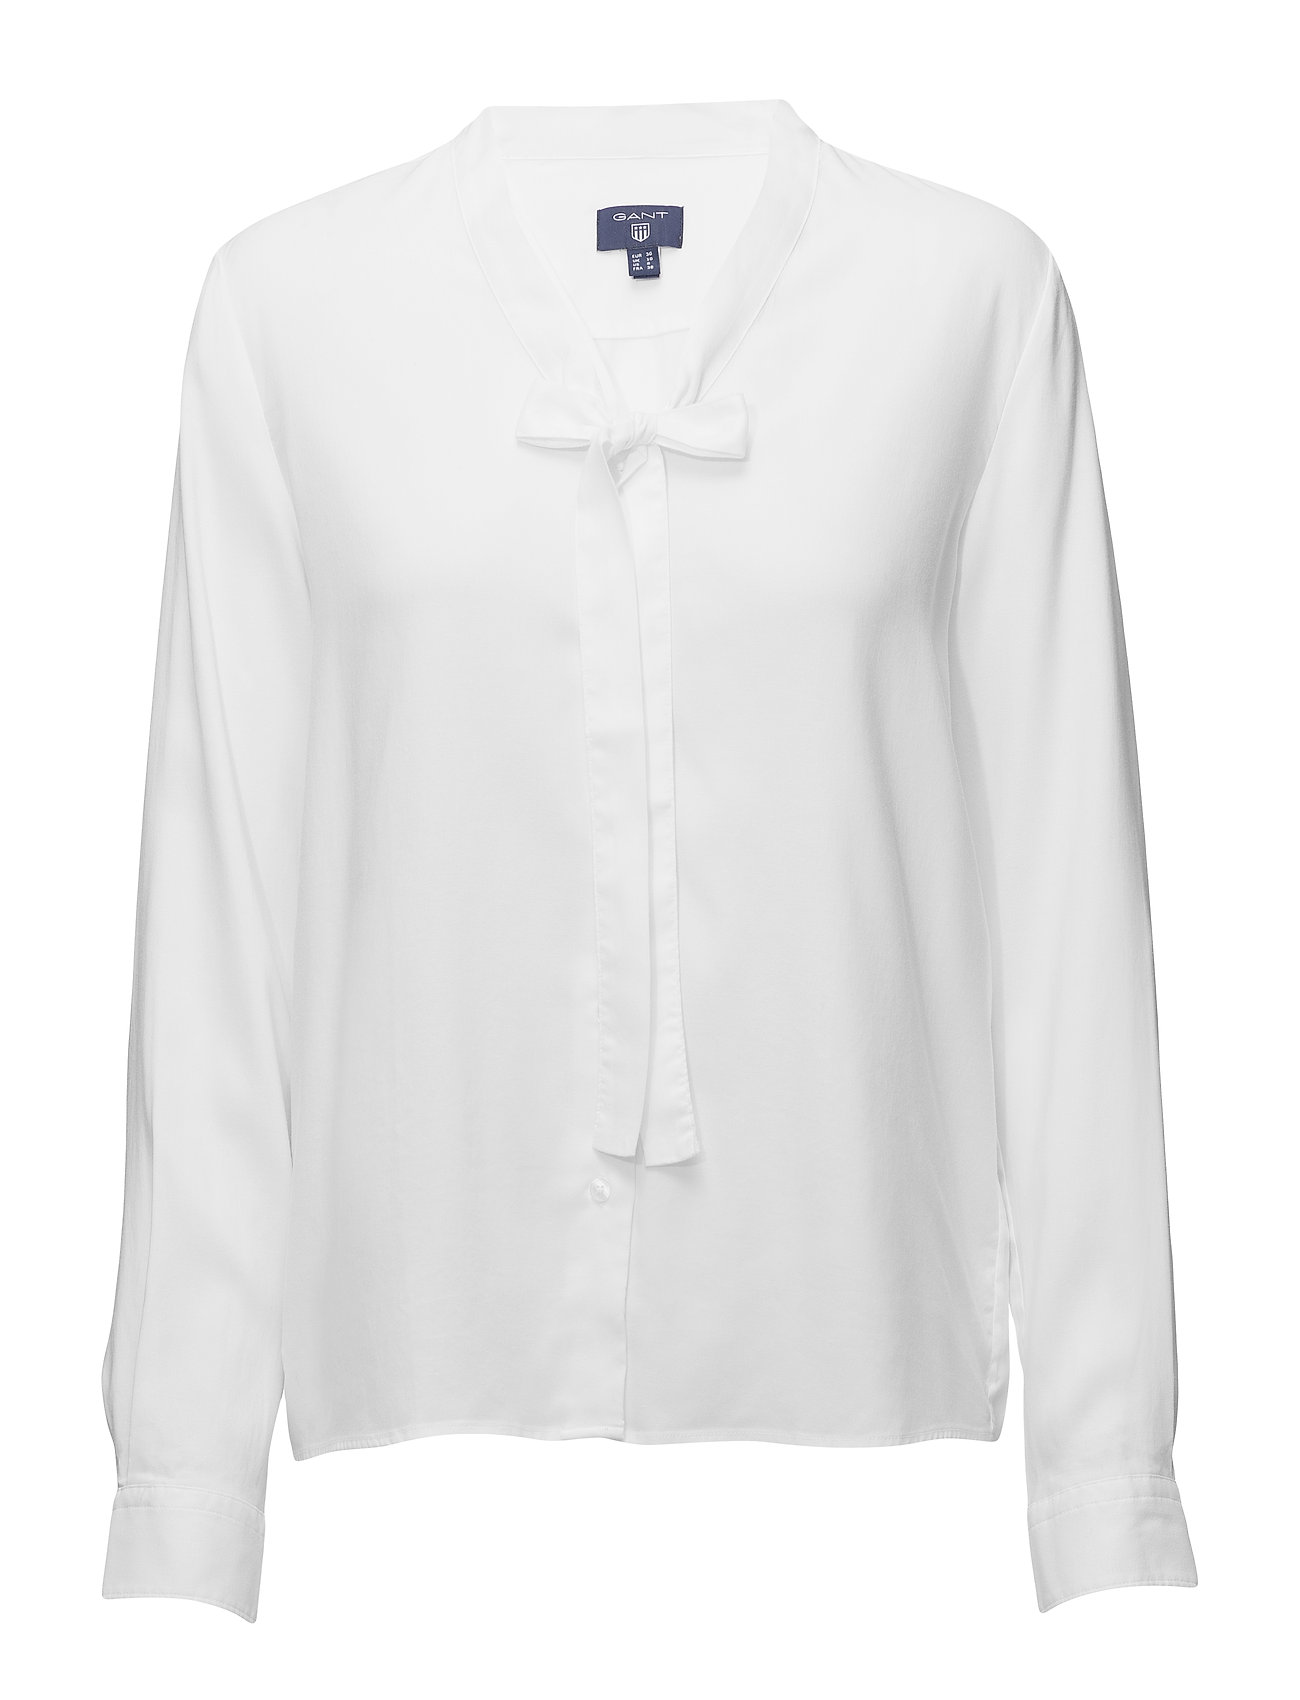 Gant O1. TP OXFORD BOW BLOUSE - WHITE